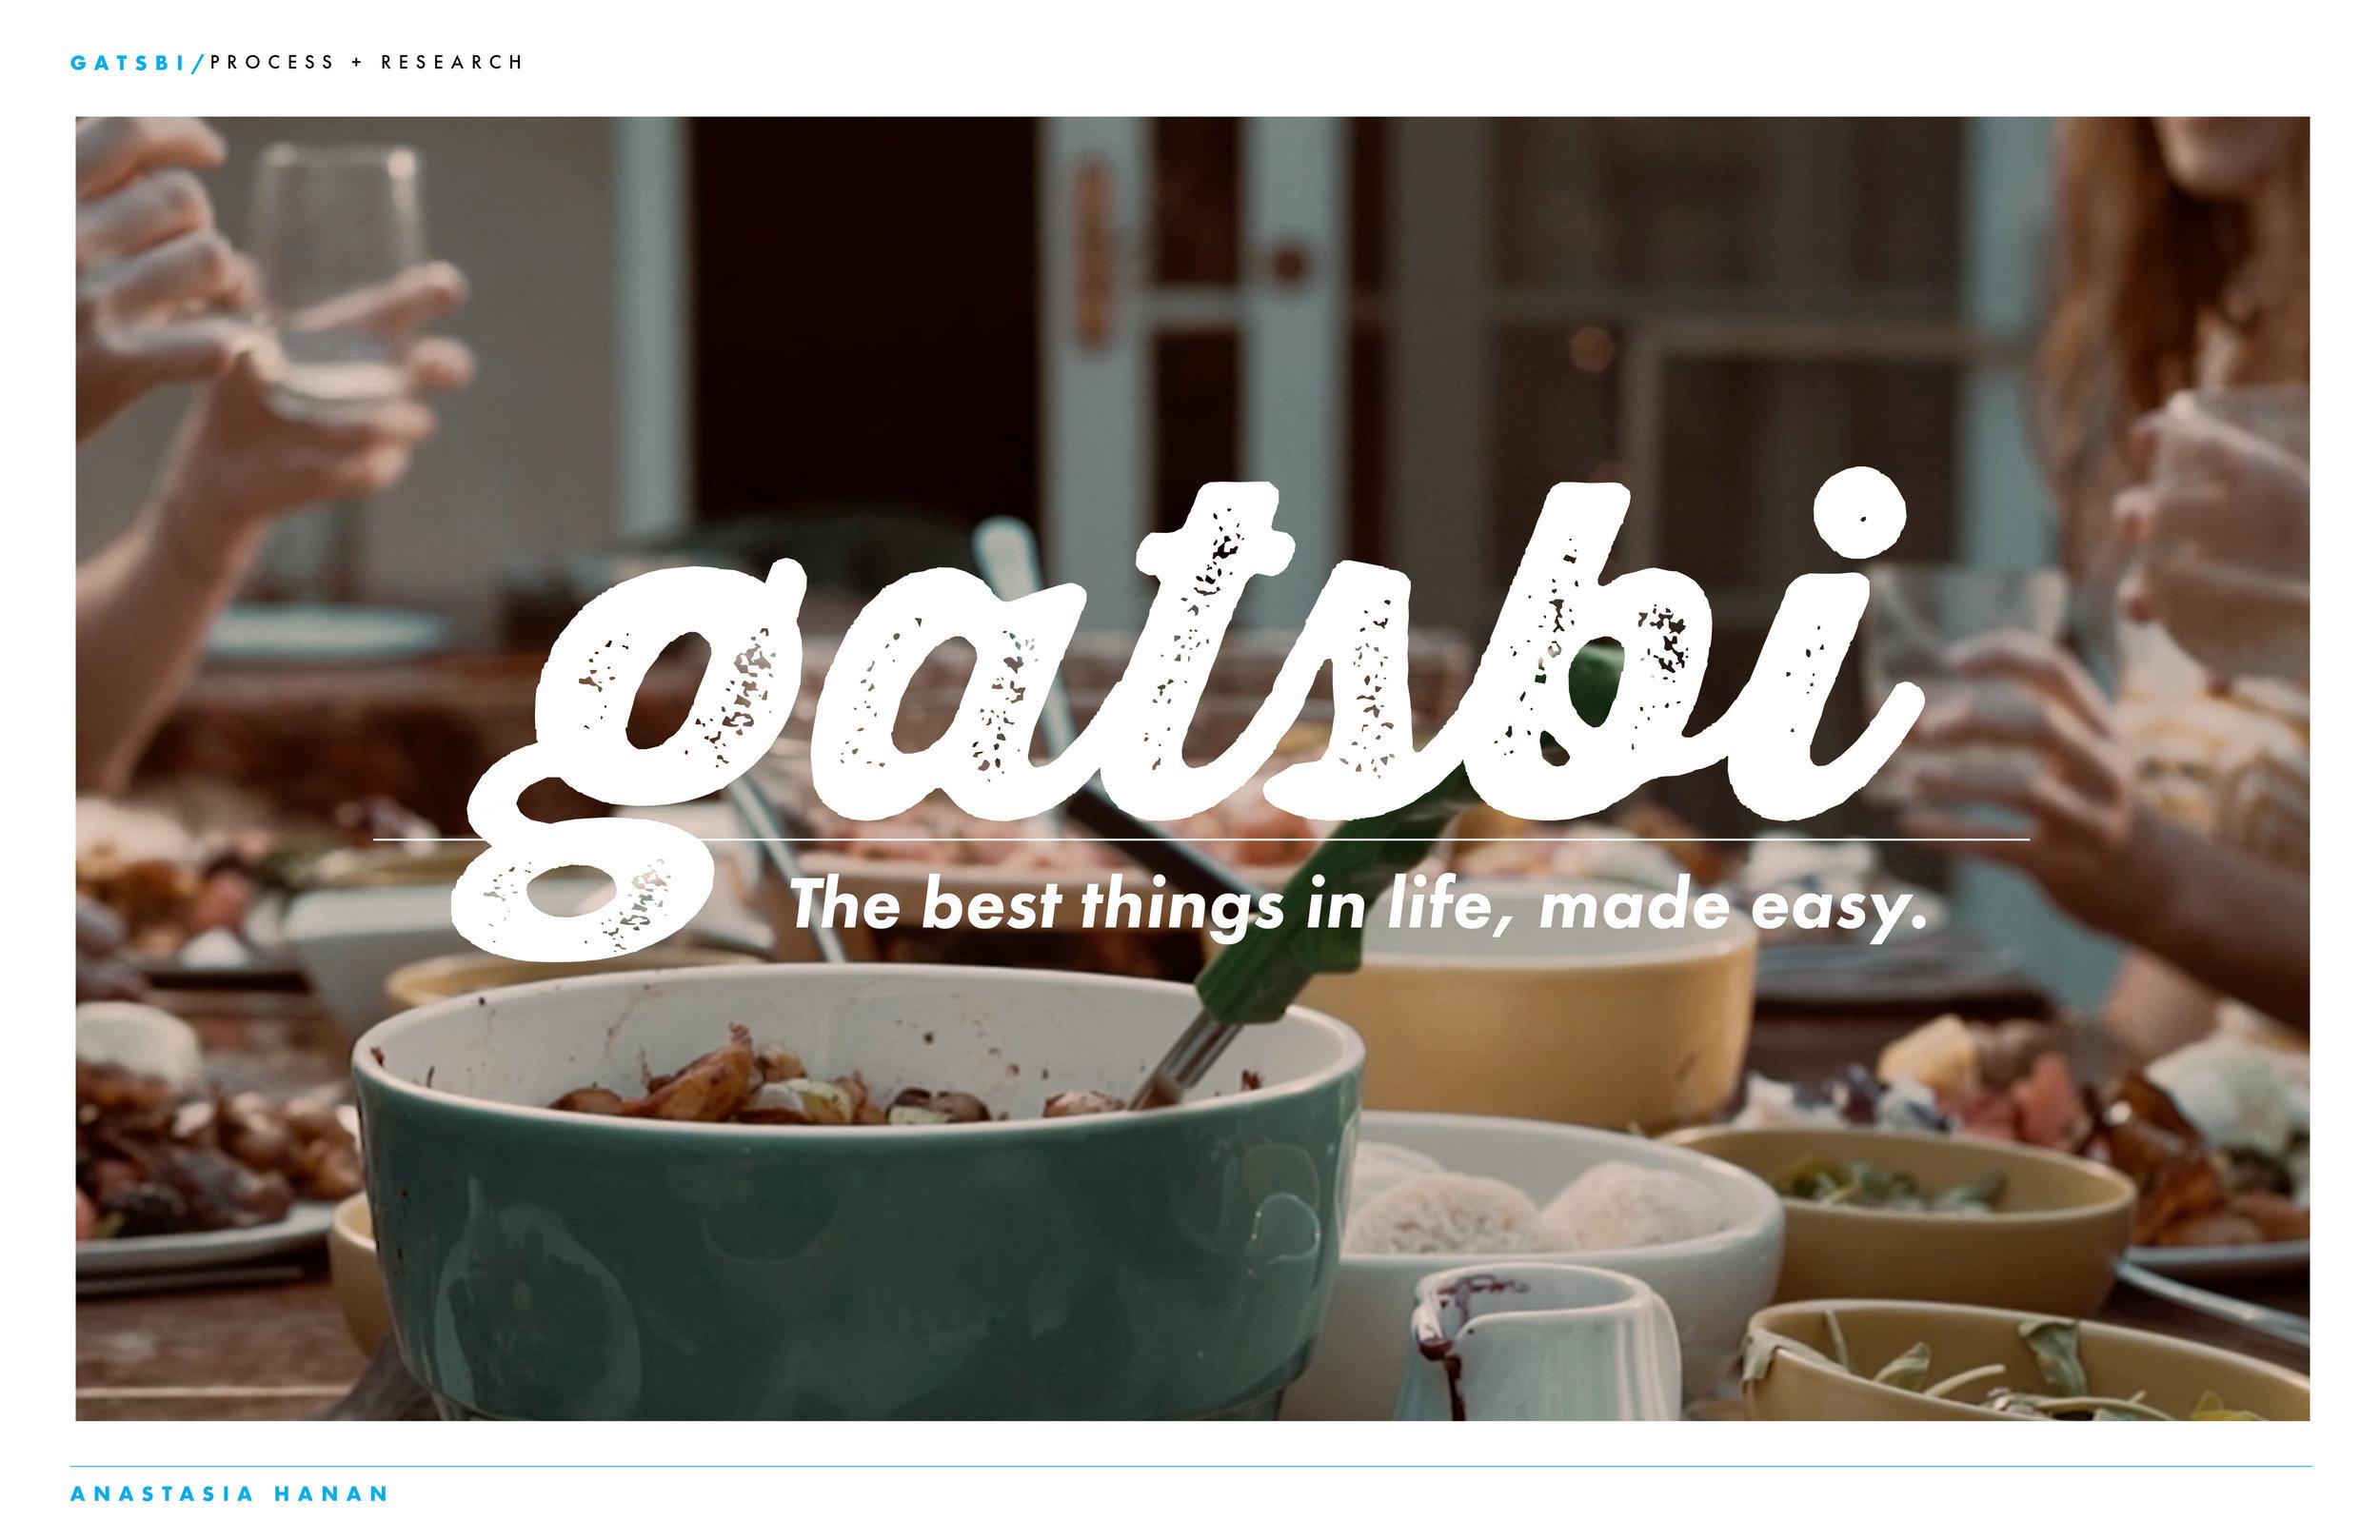 Gatsbi Process Research_Website.jpg